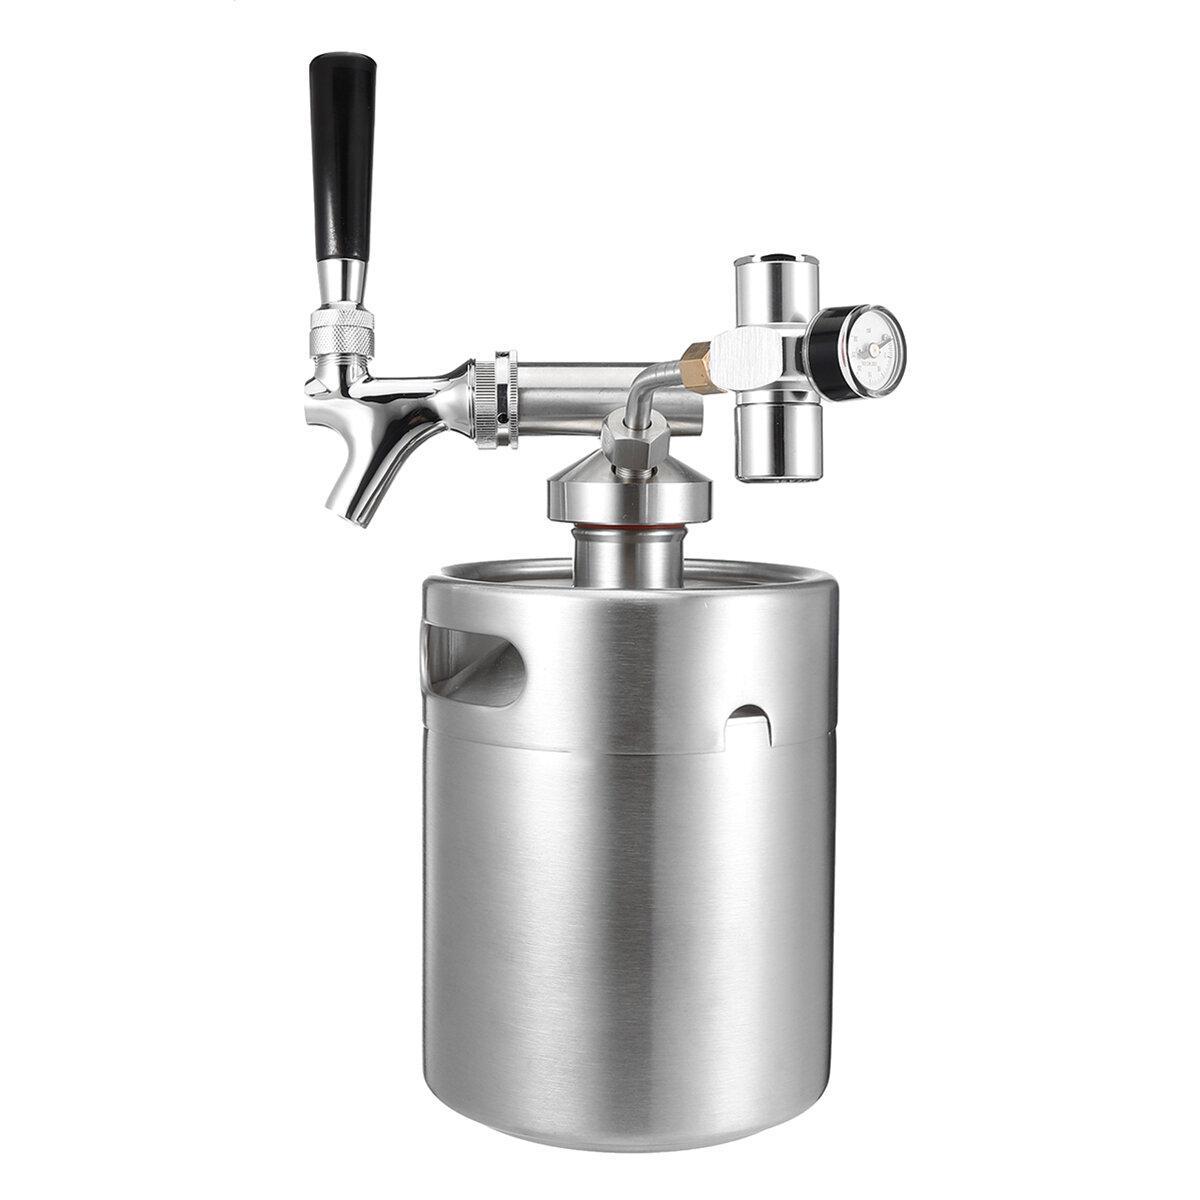 KCASA KC-BK8 4L / 2L de aço inoxidável 304 Beer Mini Keg Homebrew Keg Mini CO2 Regulador Torneira de pressão de ar Faucet Can Red Wine Brewing Bottle